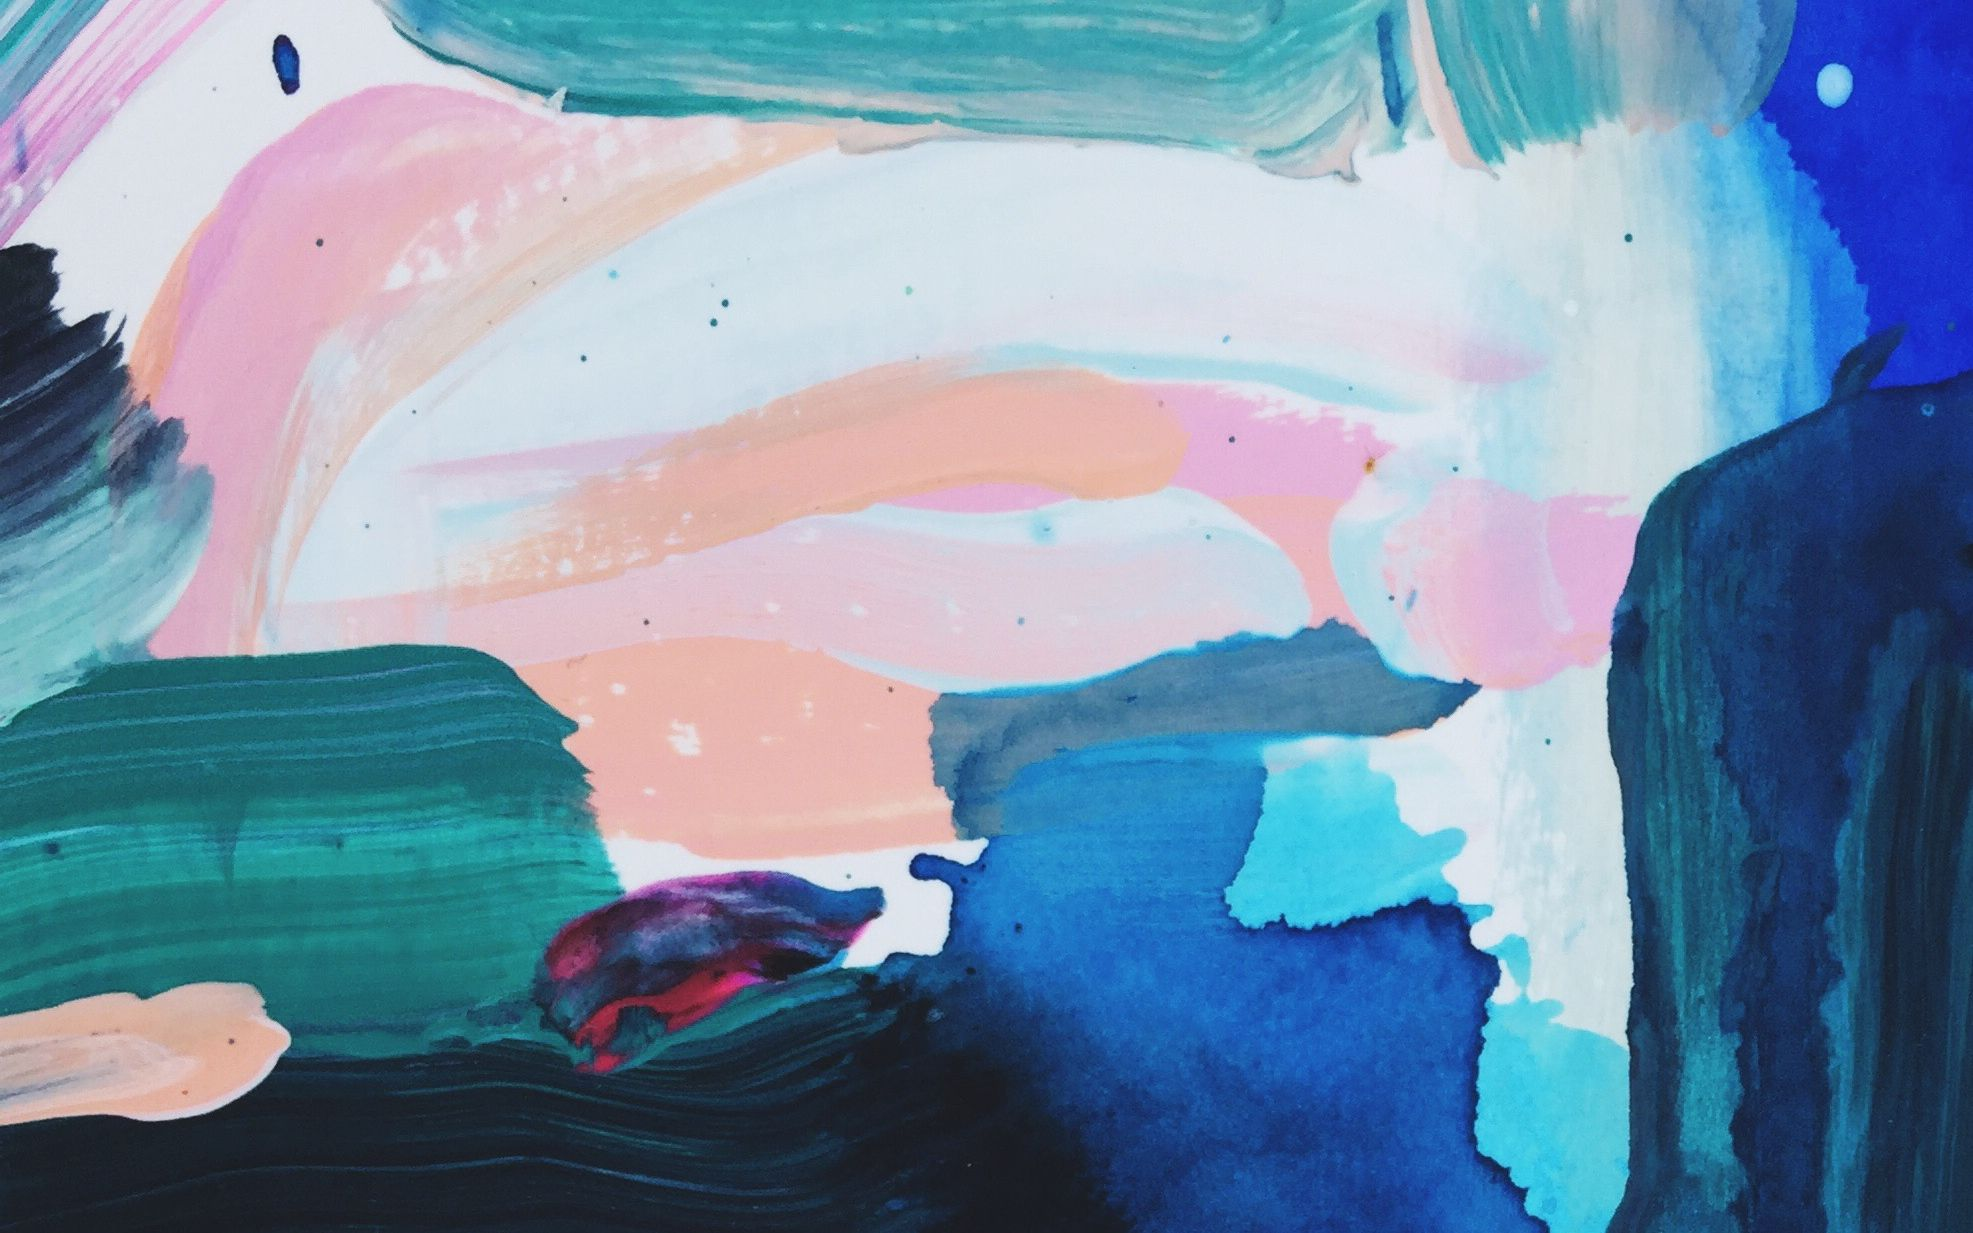 free original abstract art print/ computer wallpaper design from